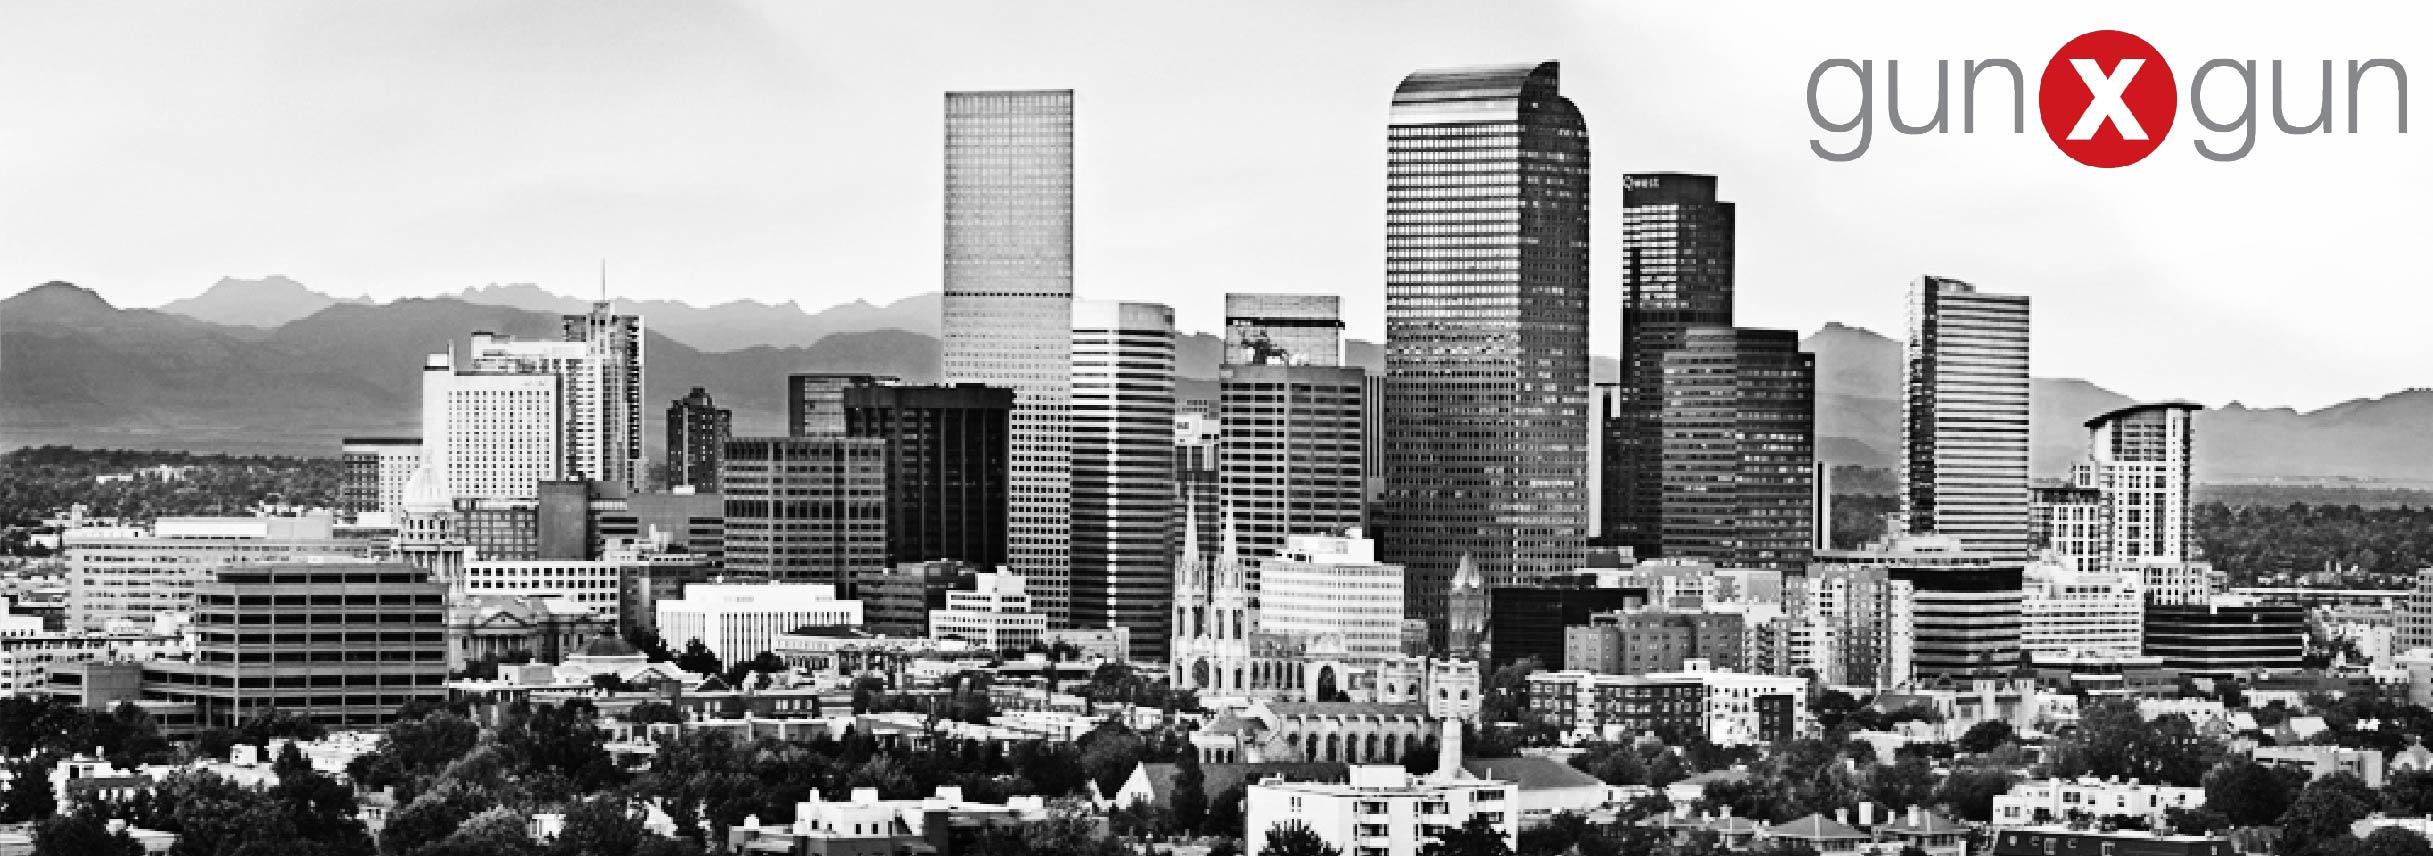 Denver_GxG-01.jpg